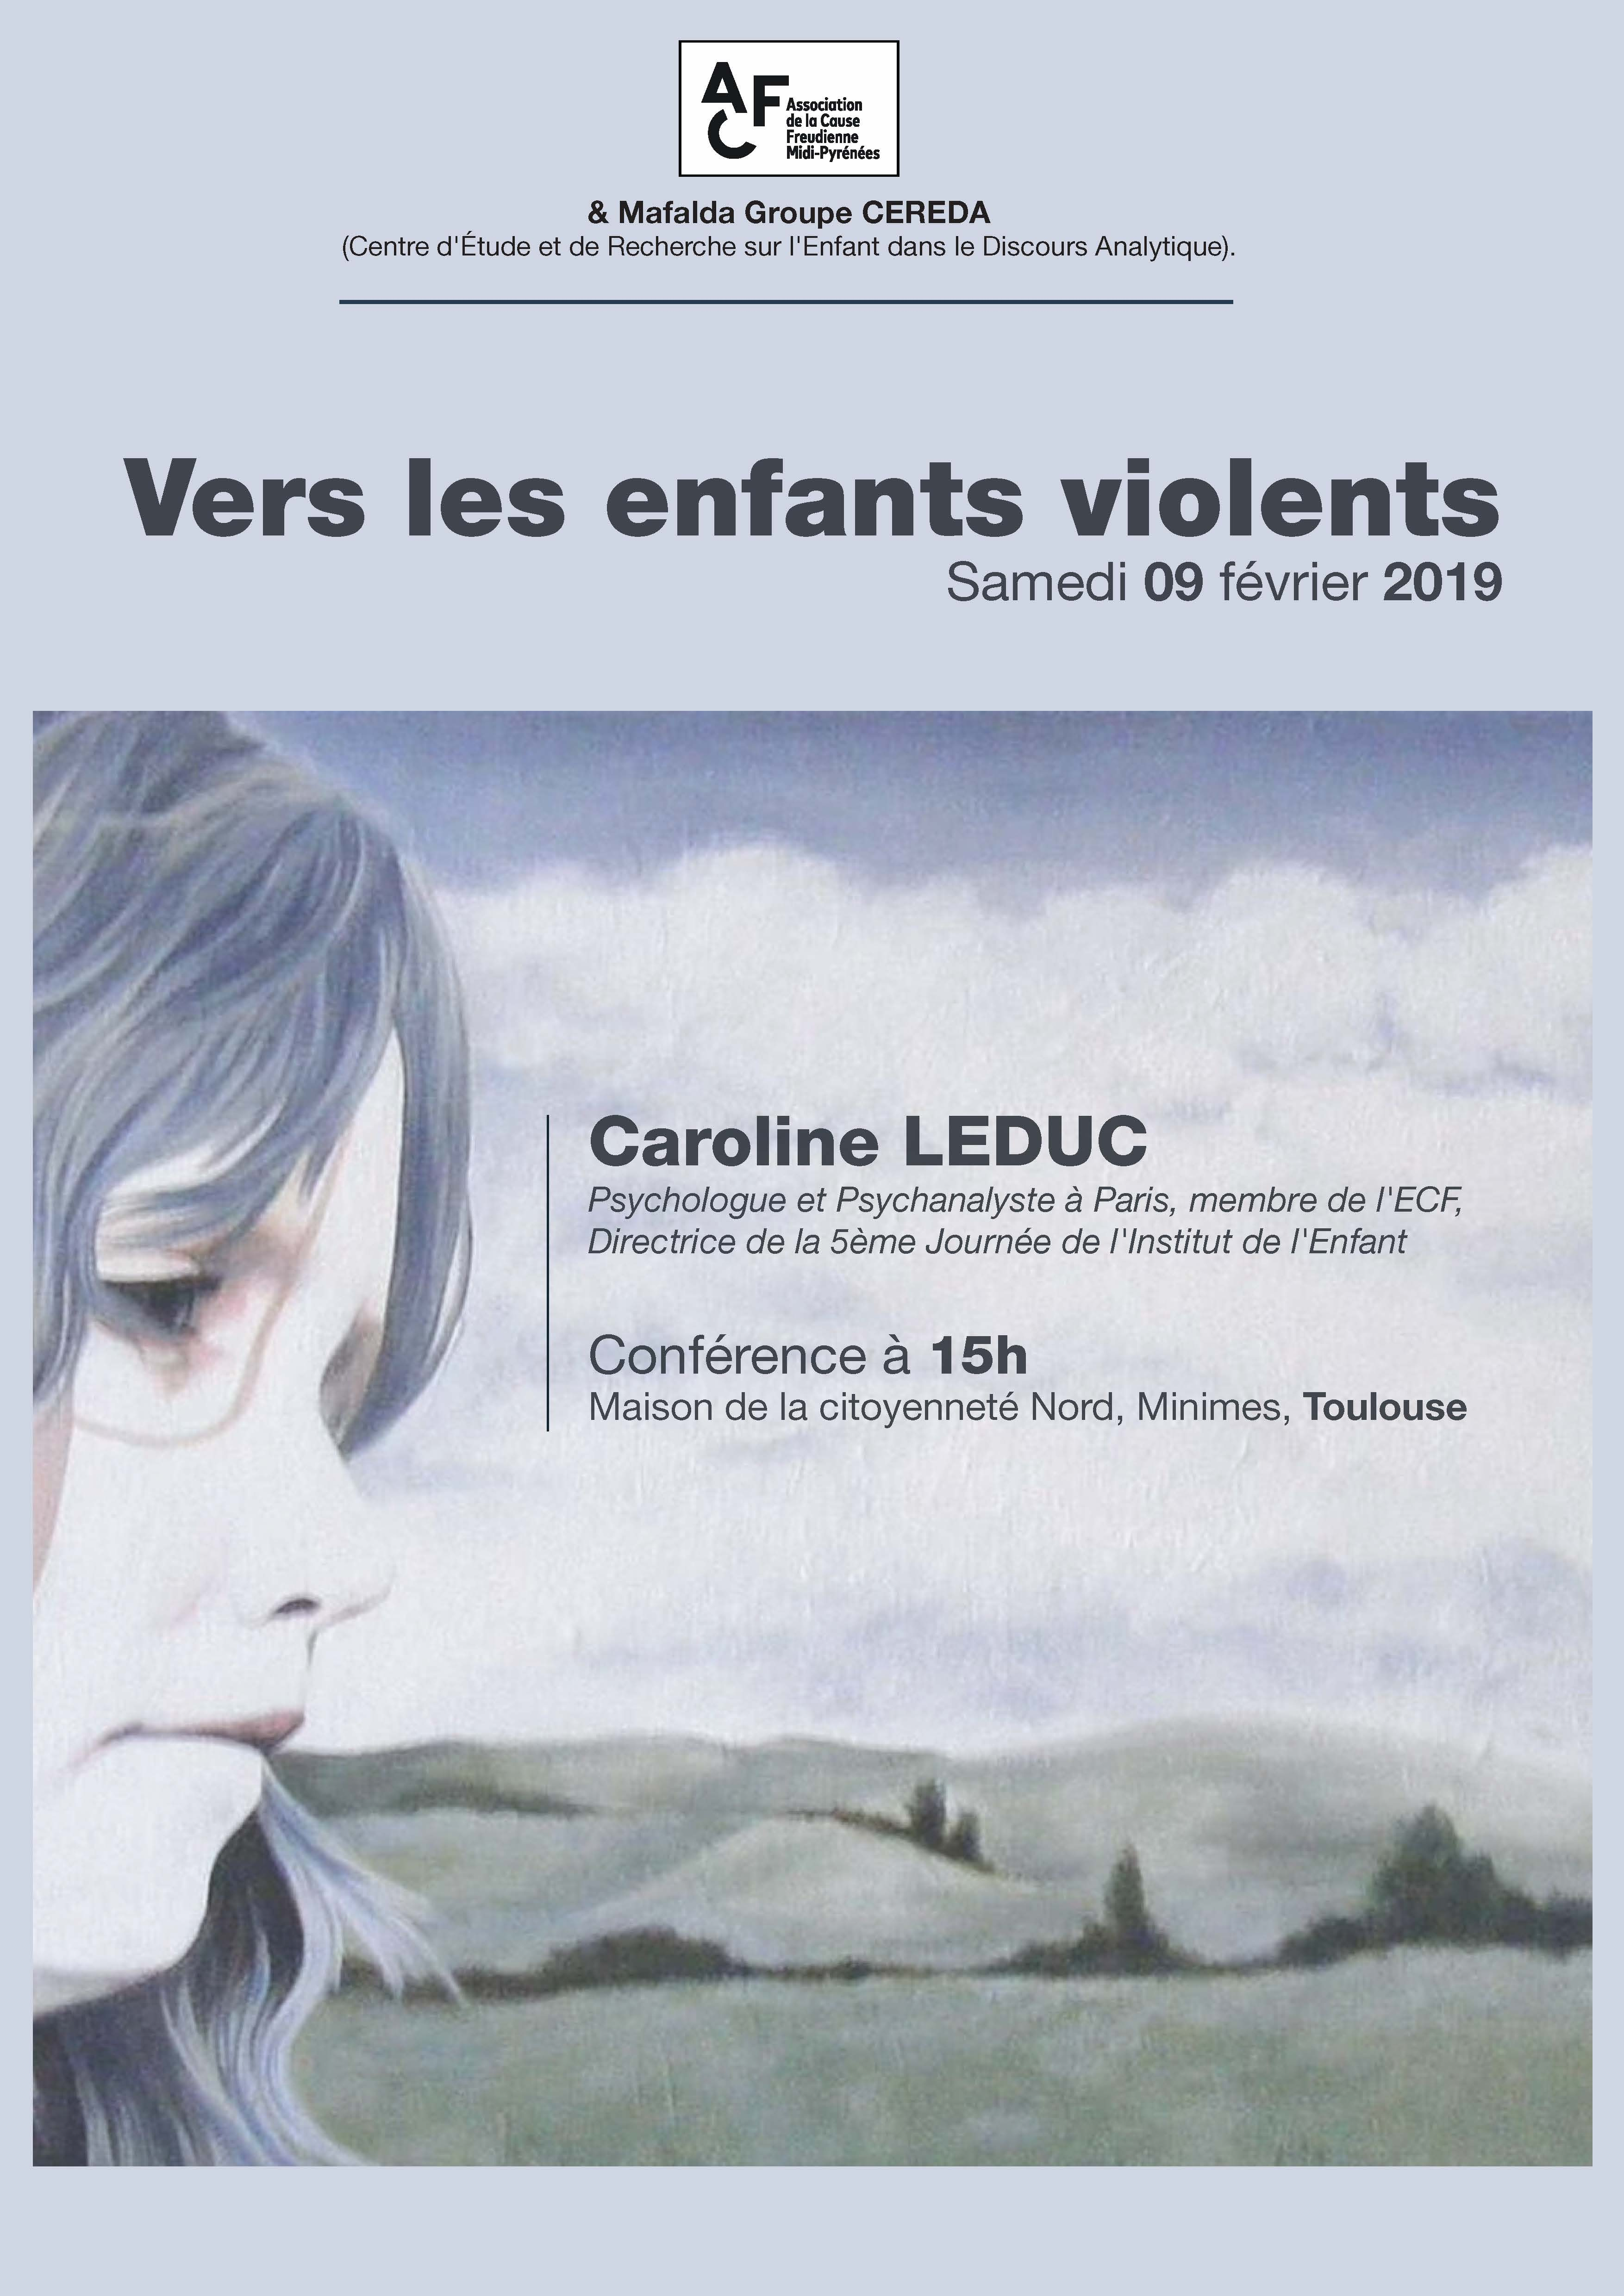 Flyer Conférence Caroline Leduc recto